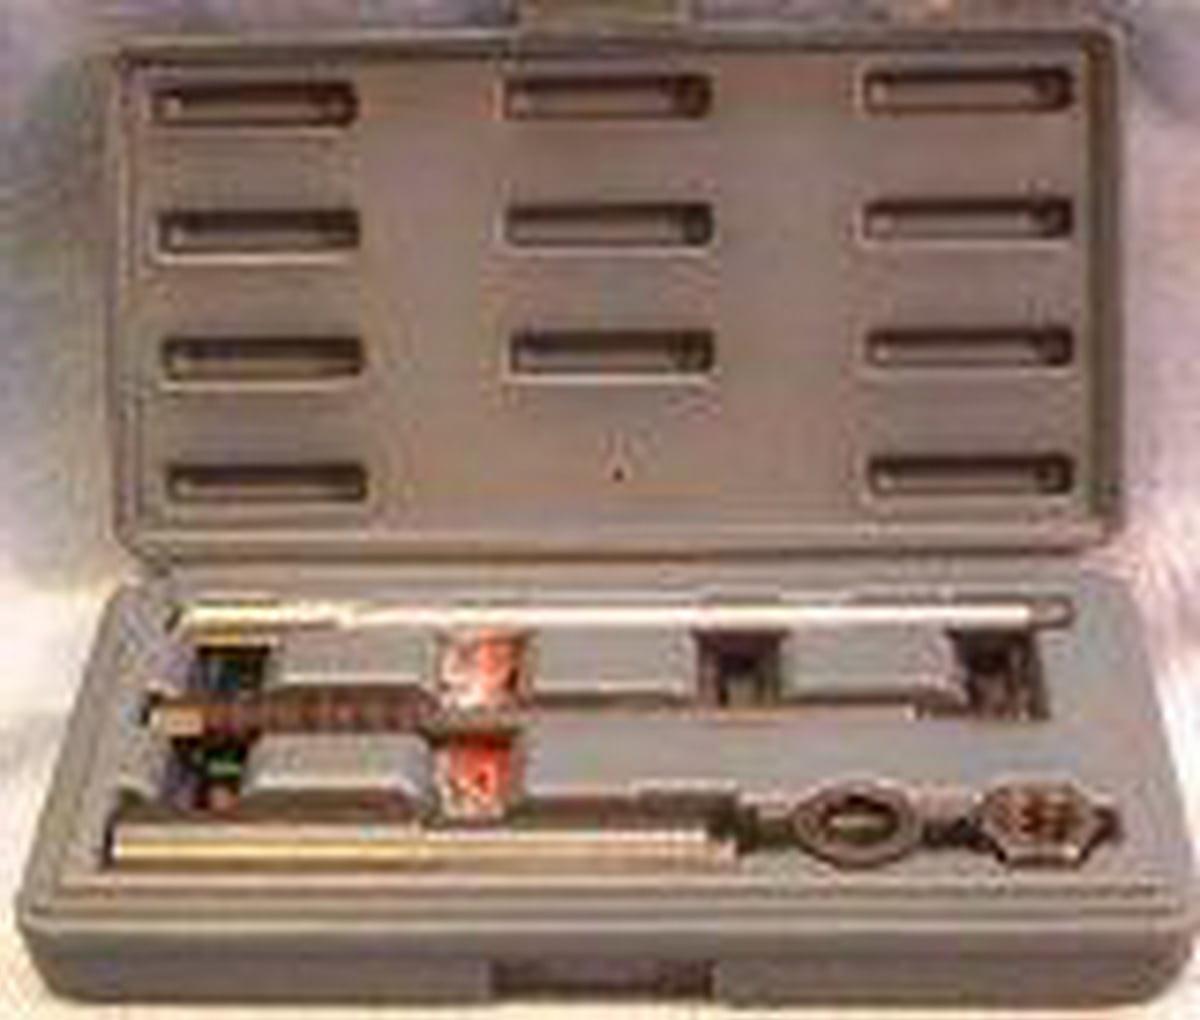 Cal-Van 39100 Ford Triton Spark Plug Extractor Set